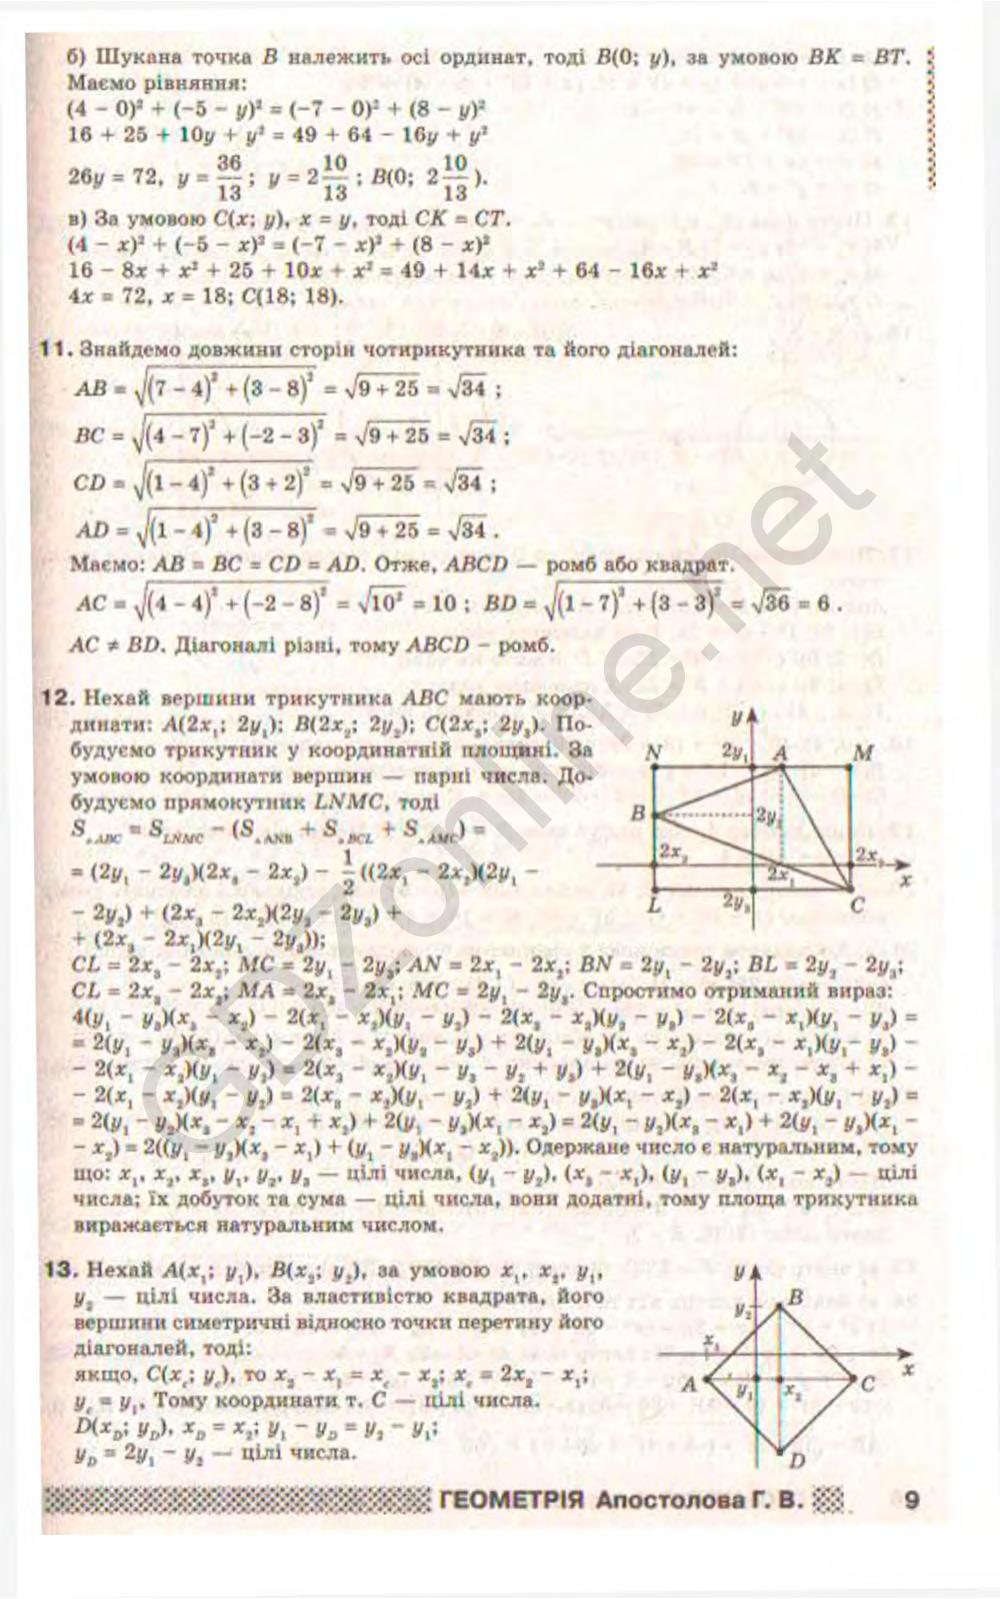 Гдз 9 класс геометрия апостолова задание